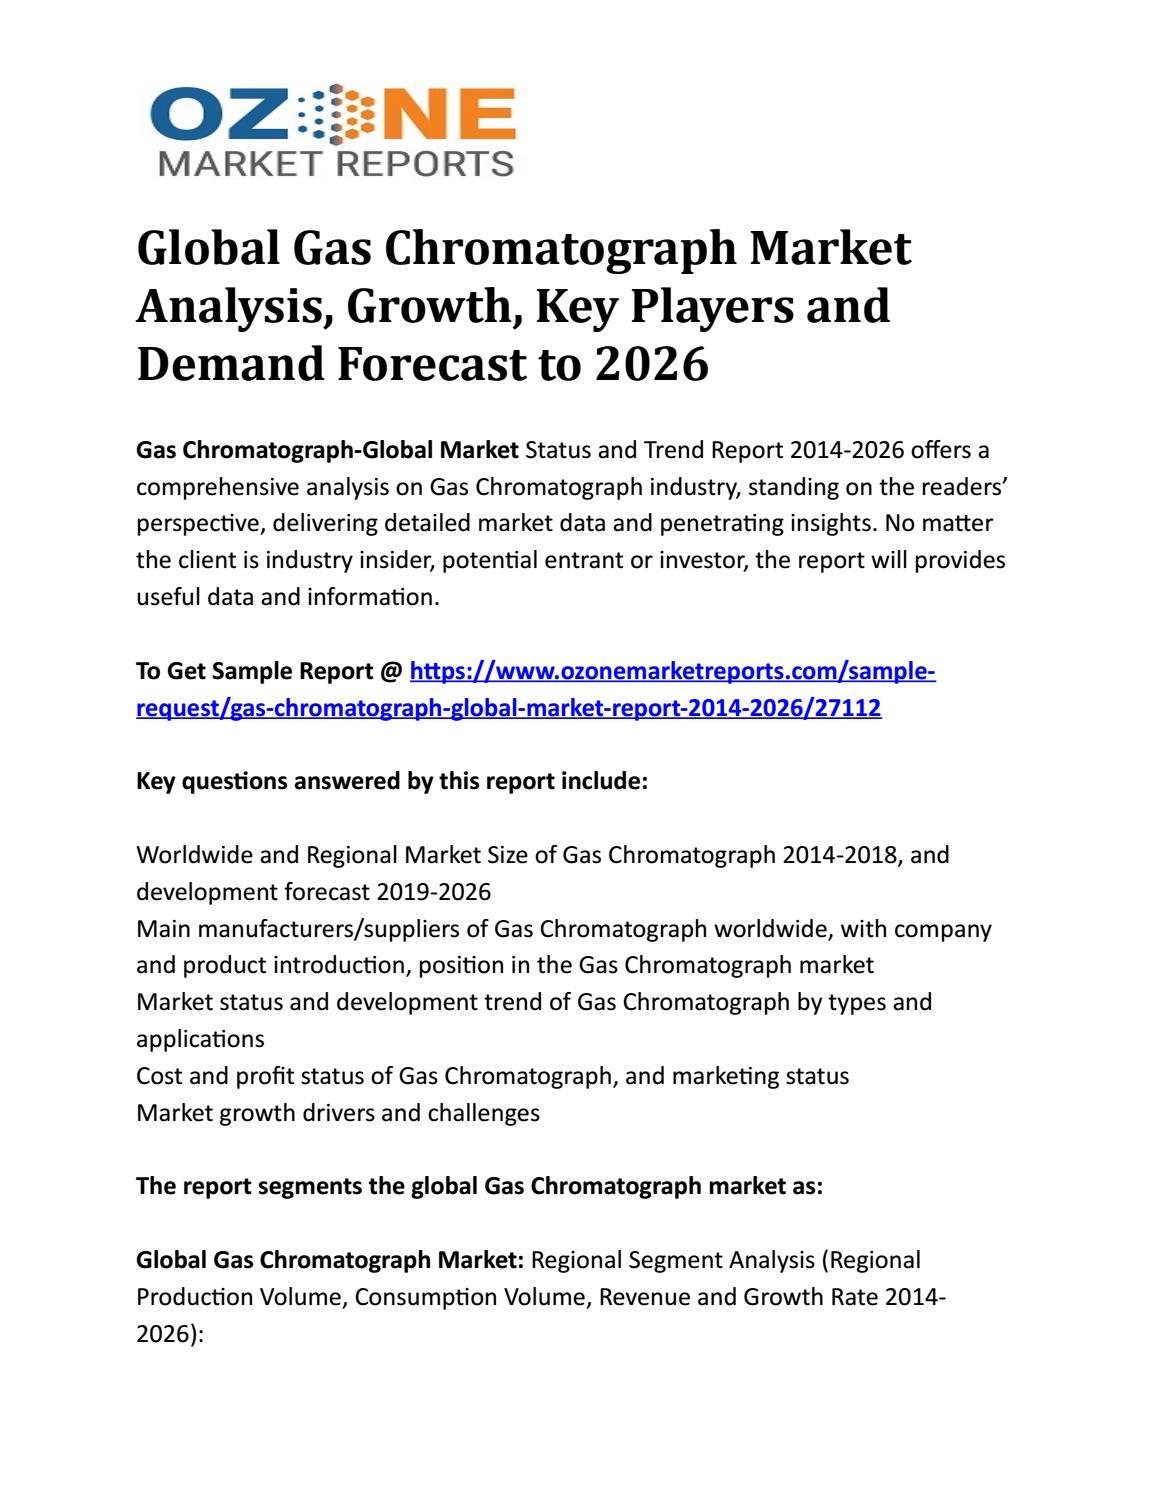 Global Gas Chromatograph Market Analysis, Growth, Key